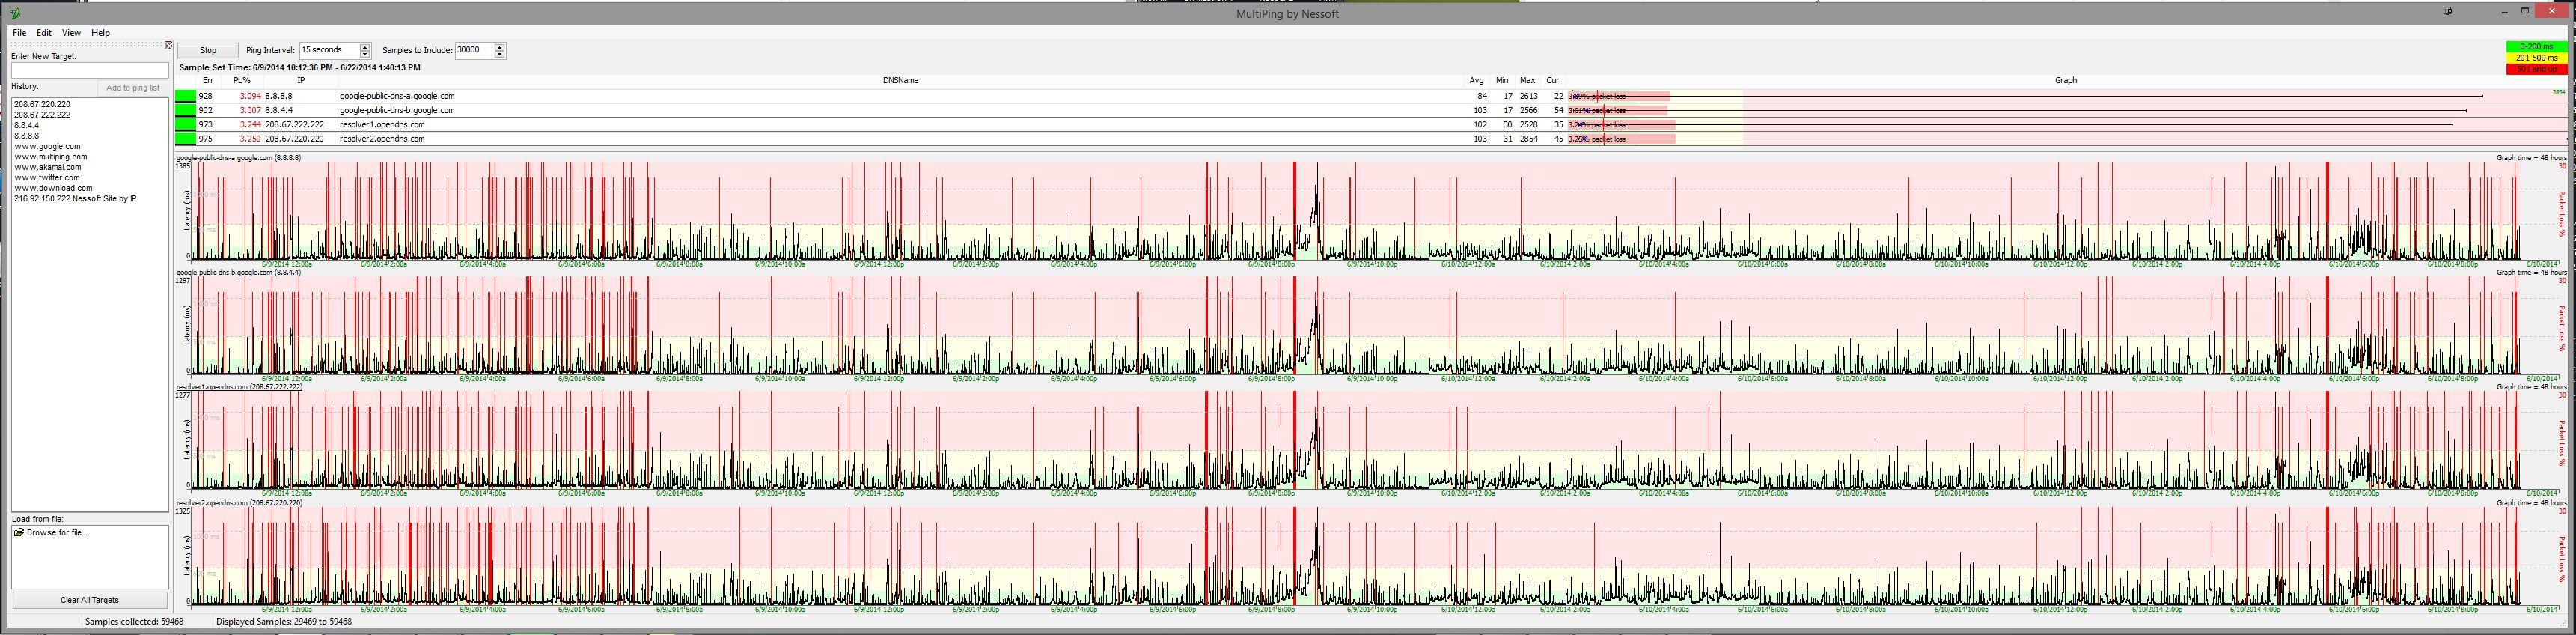 Comcast-Multiping 4.JPG